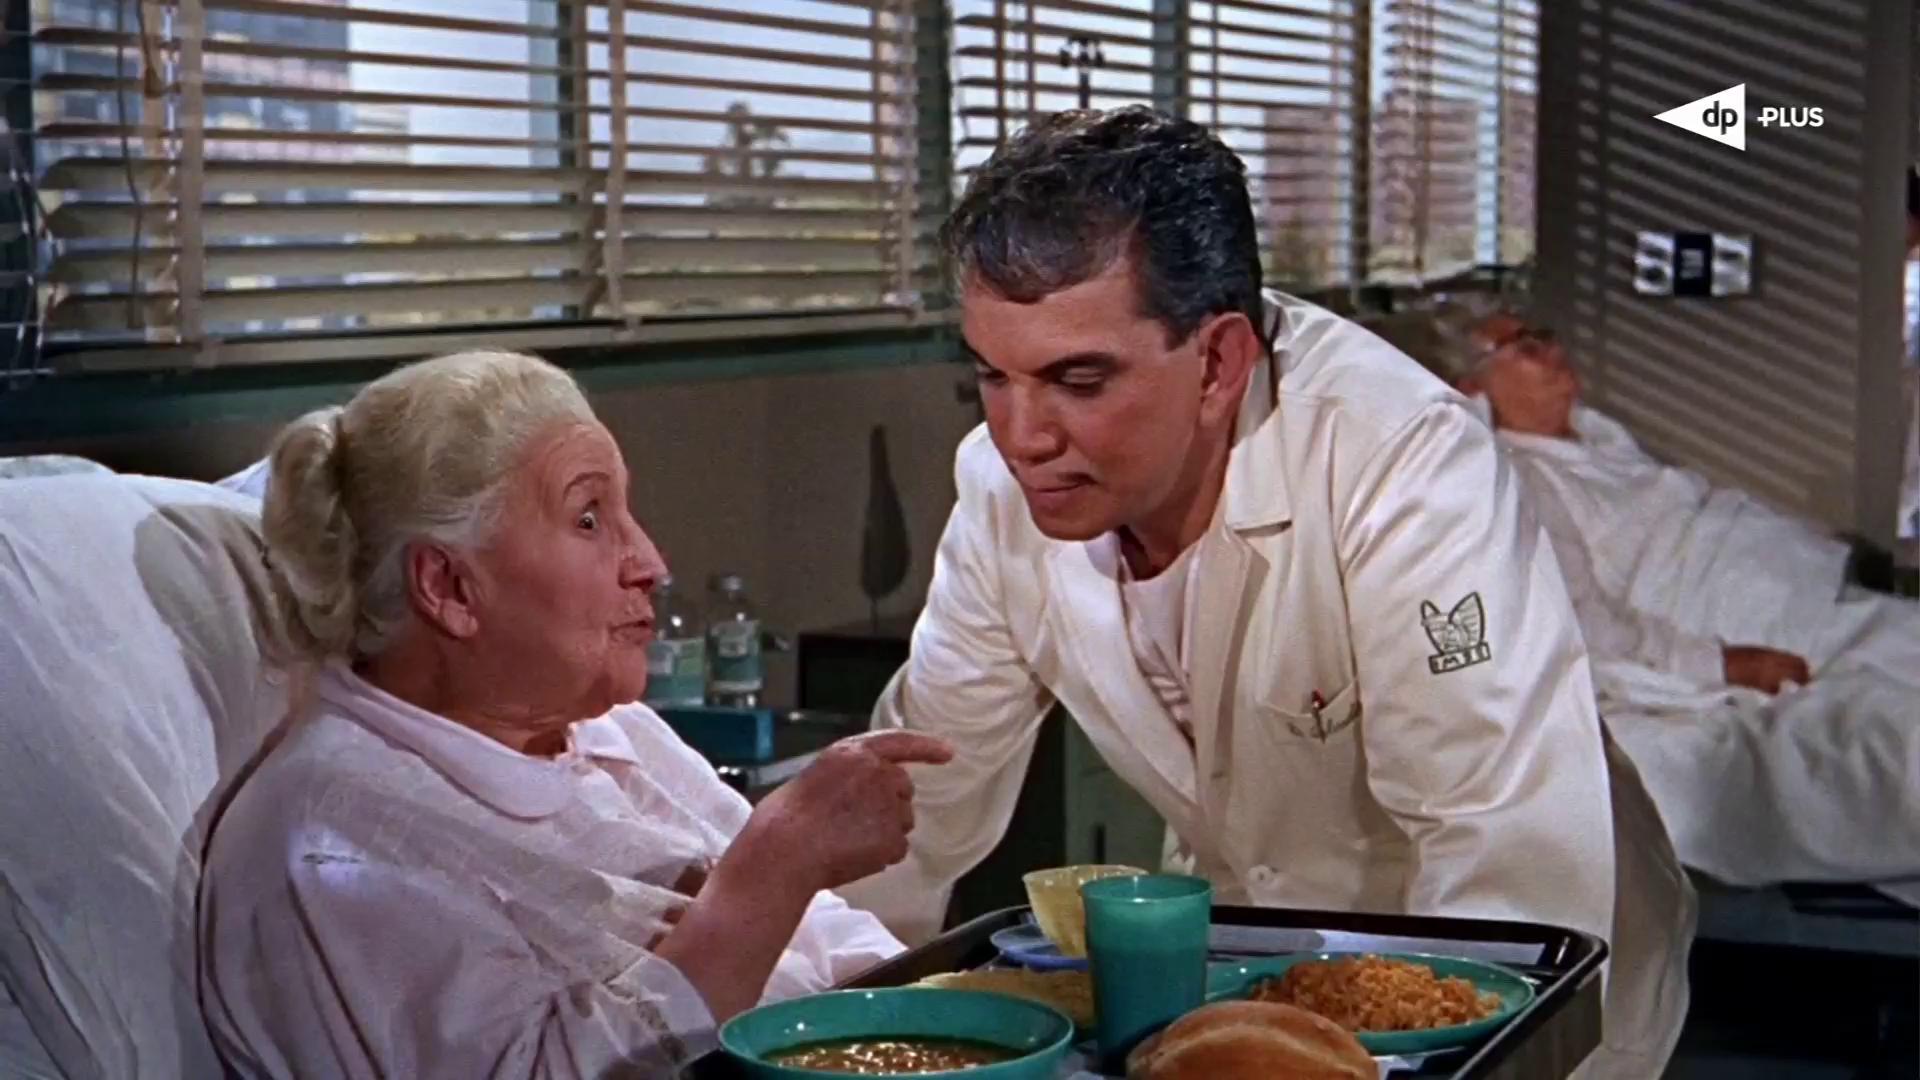 Cantinflas El señor doctor (1965) HDTV 1080p AAC